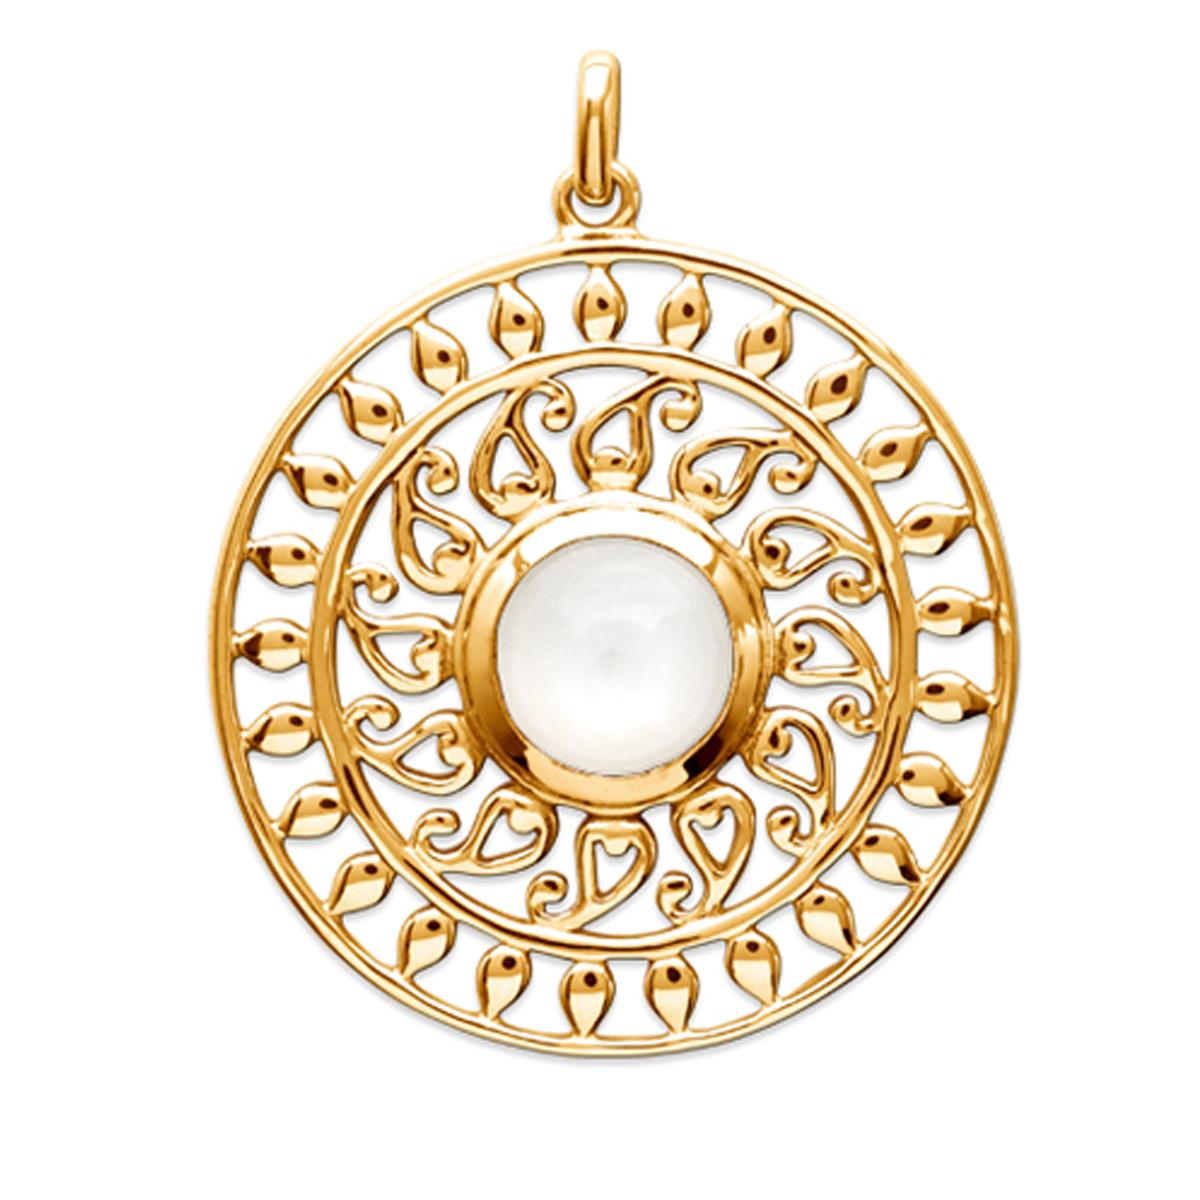 Pendentif Plaqué Or \'Cléopatra\' pierre de lune doré - 28 mm - [Q6637]